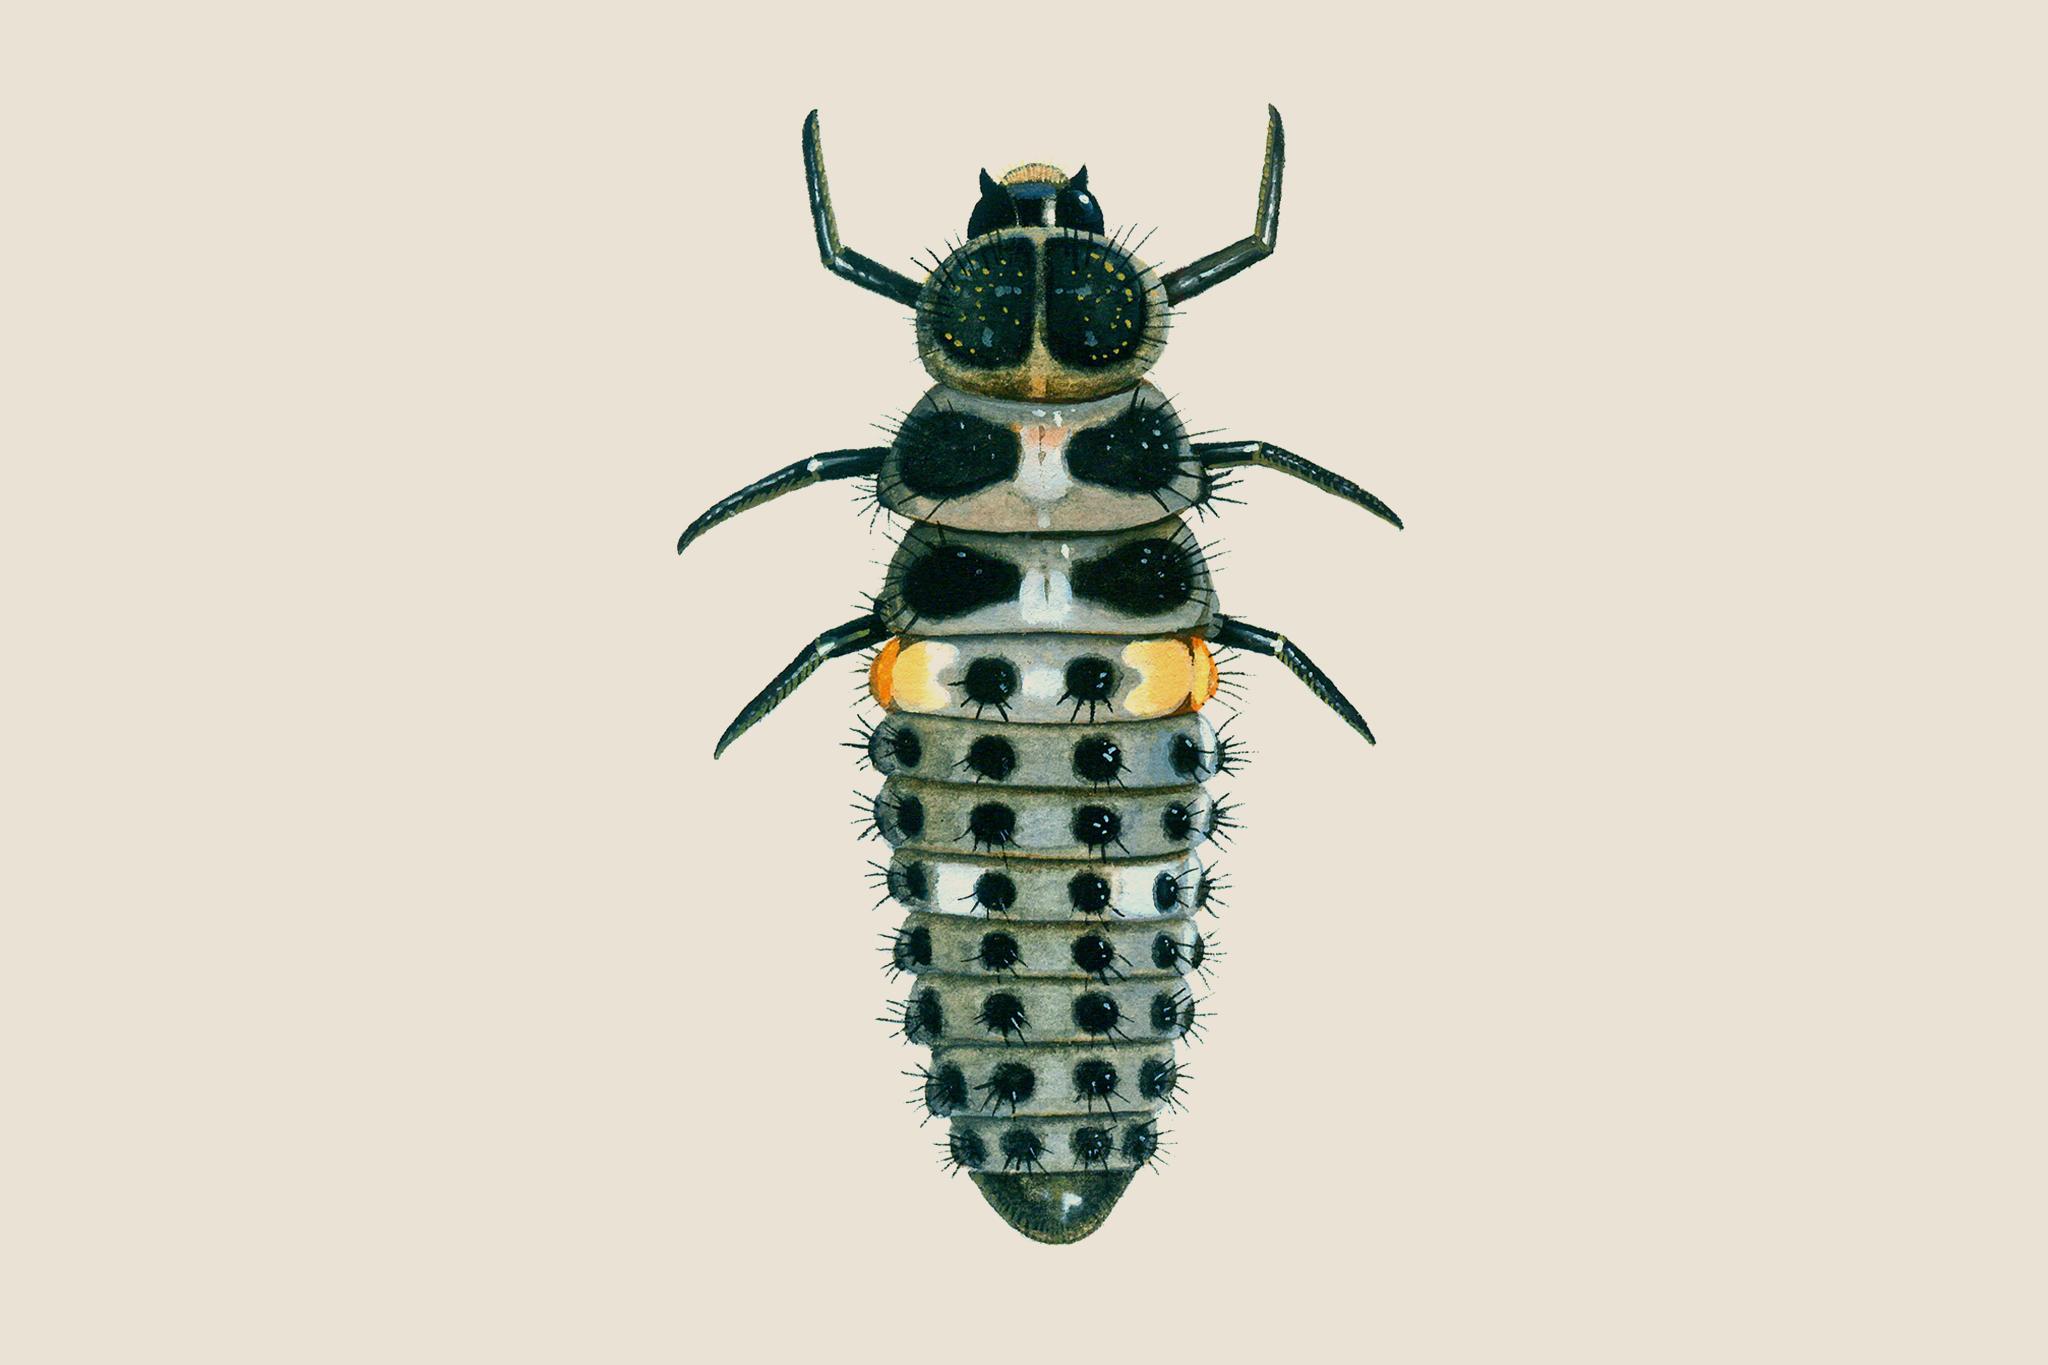 Ten-spot ladybird larvae